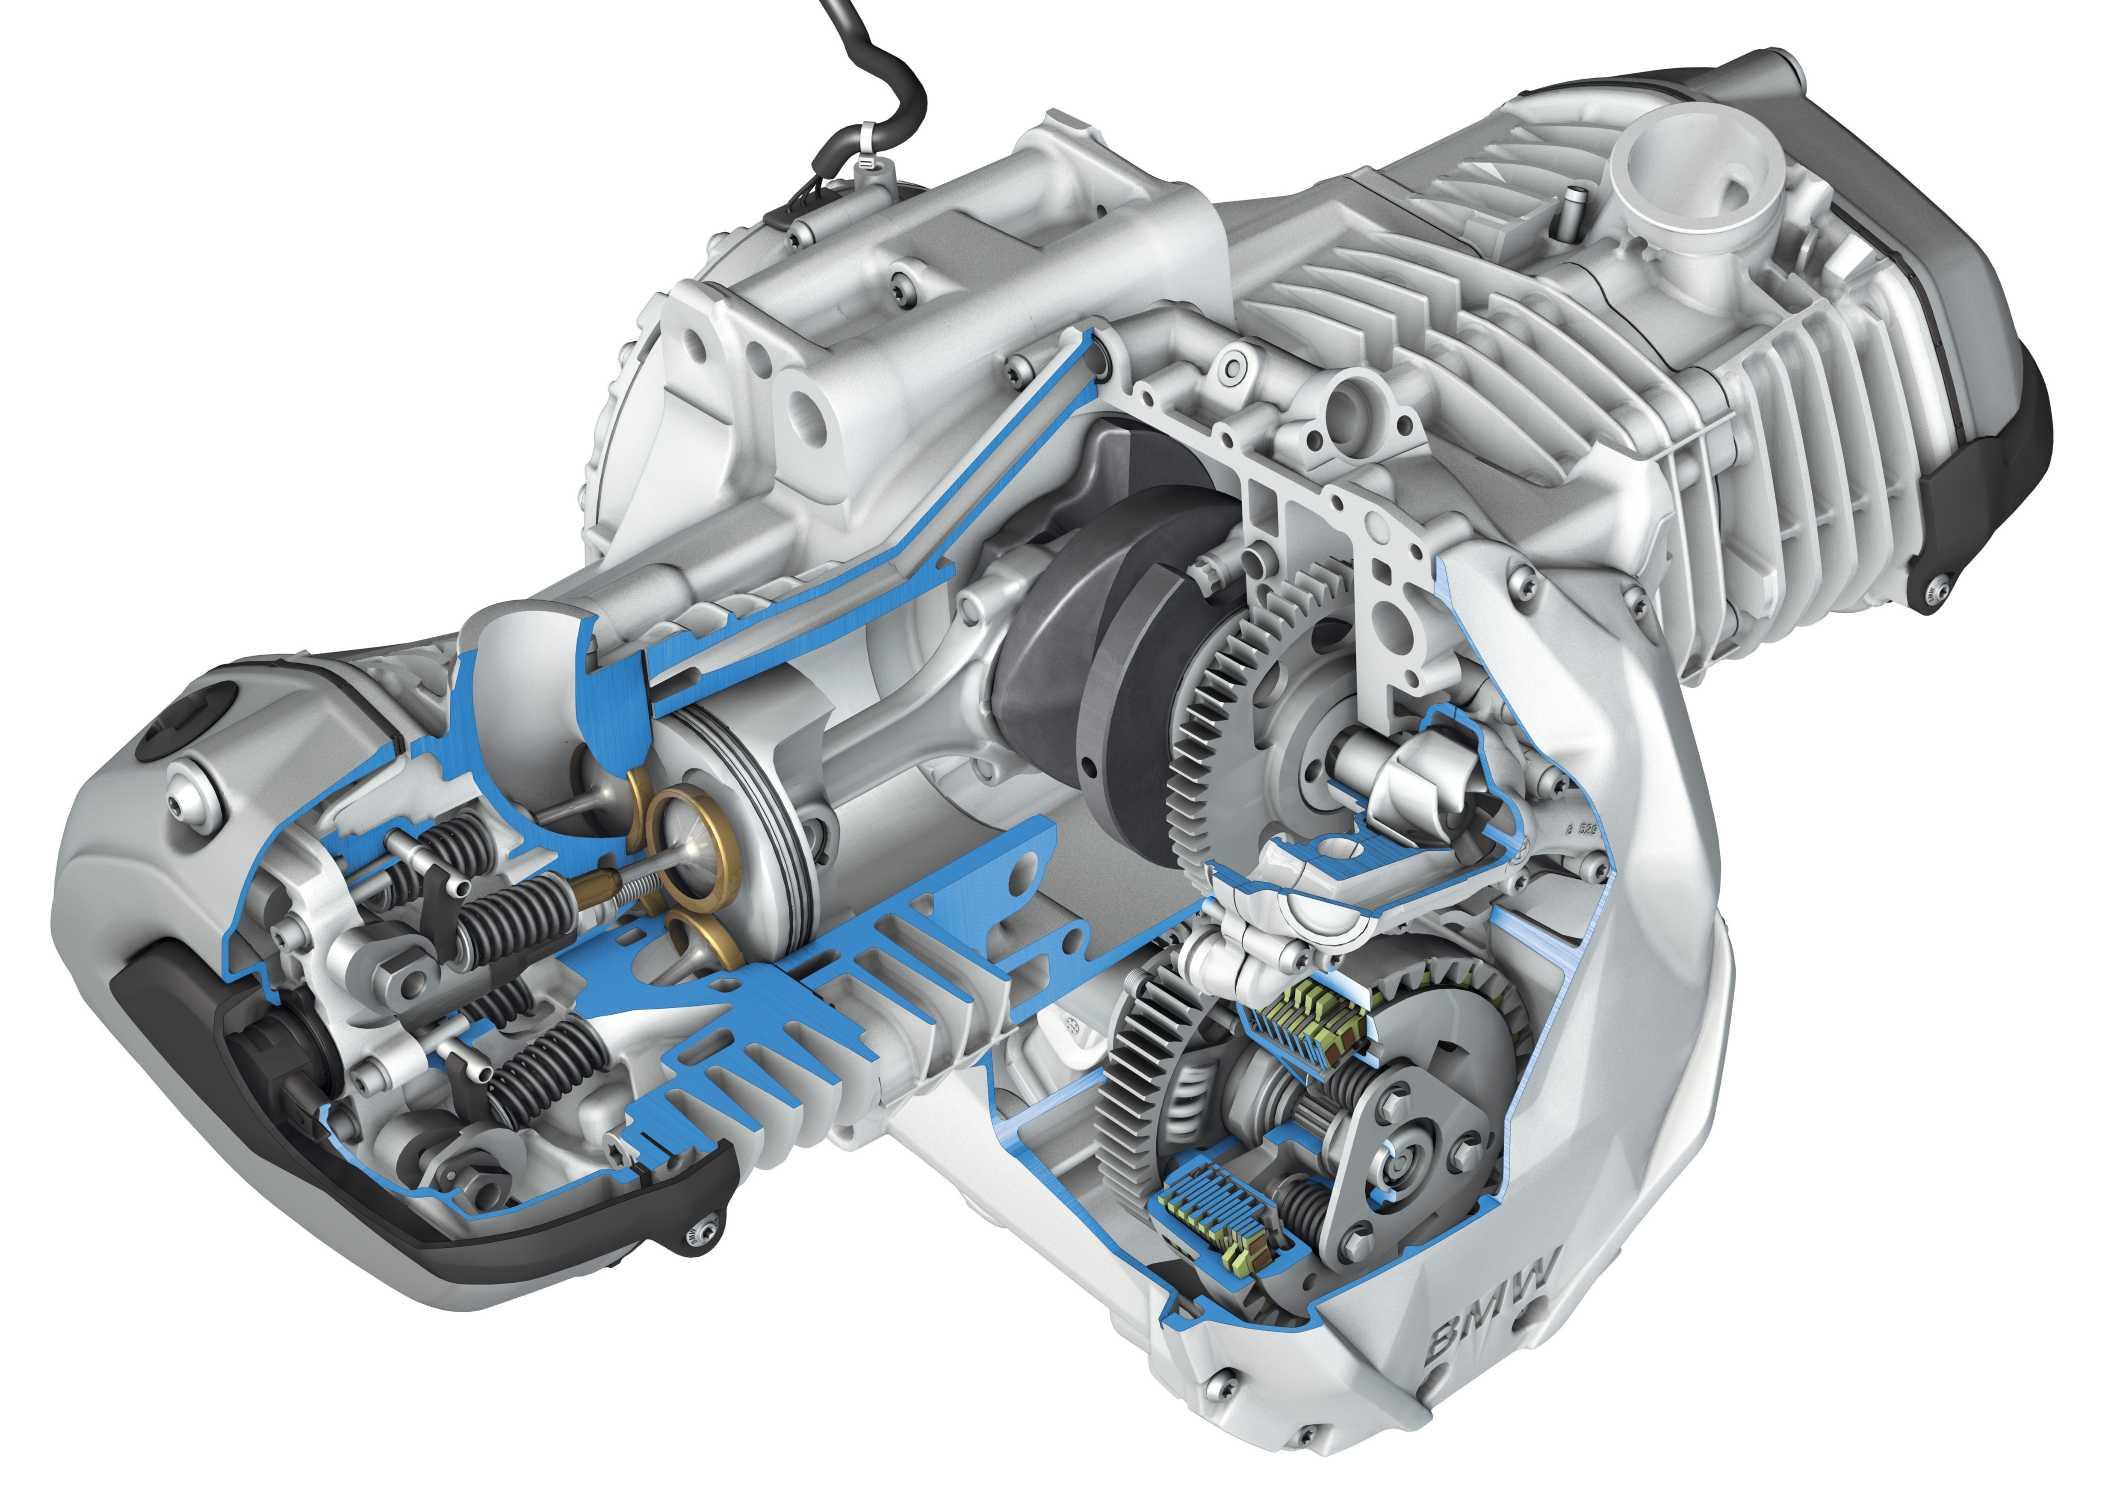 Peugeot Boxer Engine Diagram